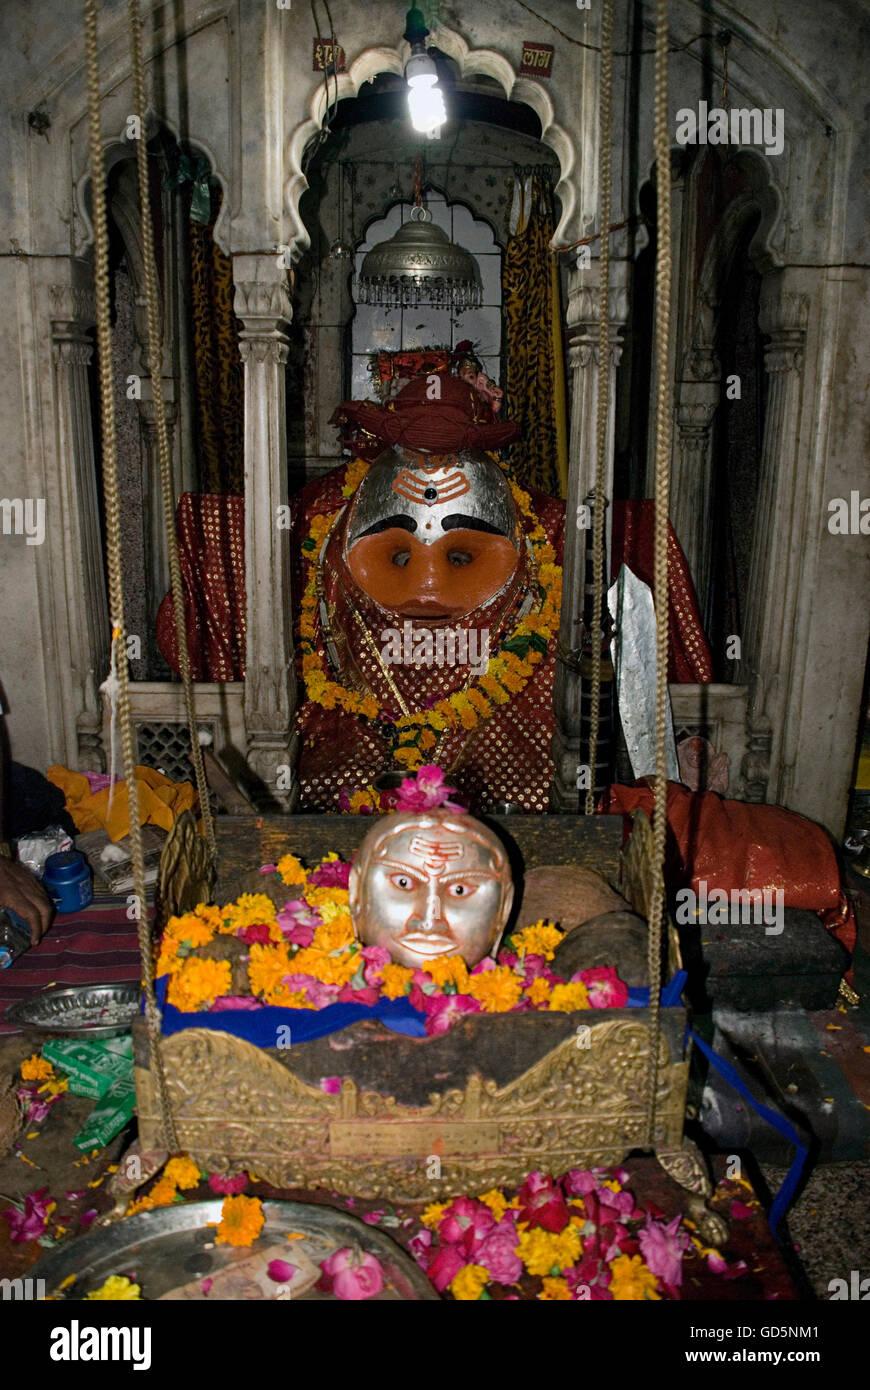 shree kaal bhairav temple GD5NM1